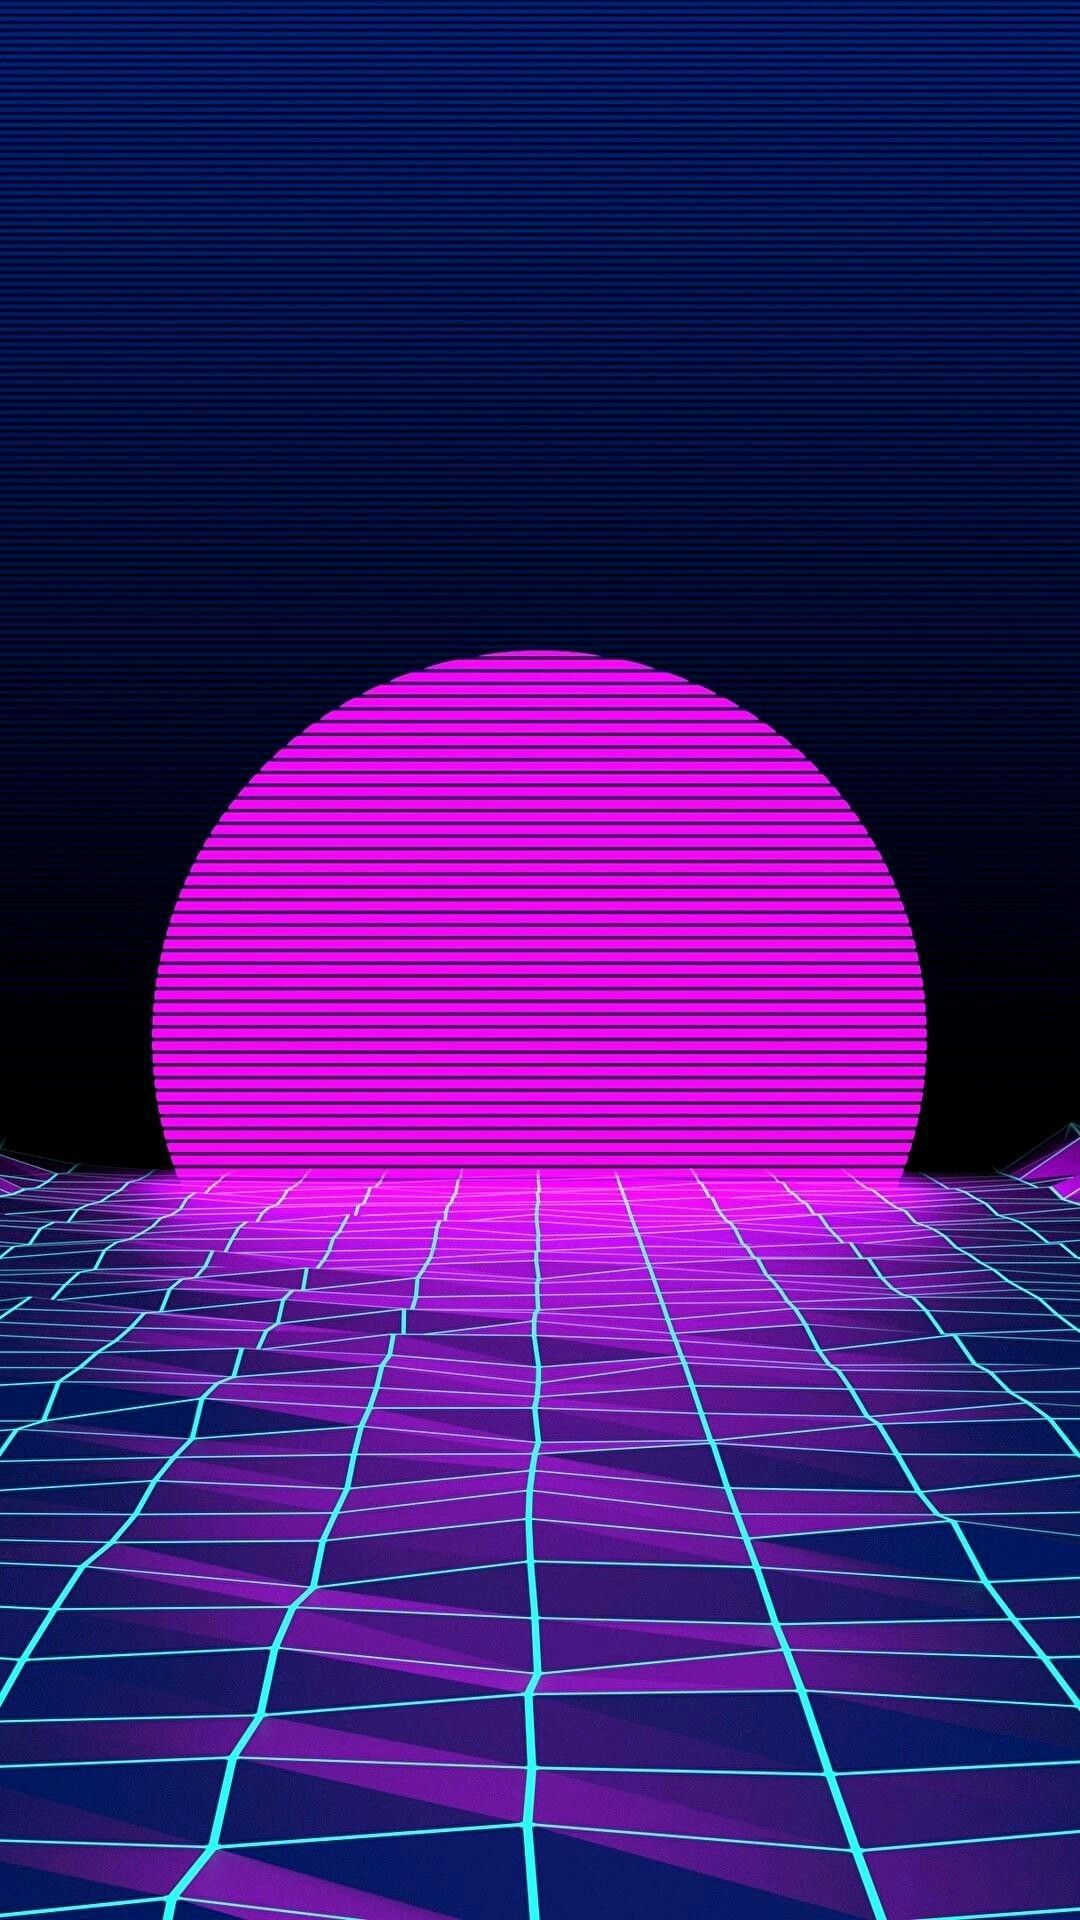 Res: 1080x1920, Vaporwave Wallpaper, Indie Art, Graphic Art, Iphone Wallpapers, Panda,  Fantasy Art, Style, Purple Aesthetic, Trippy